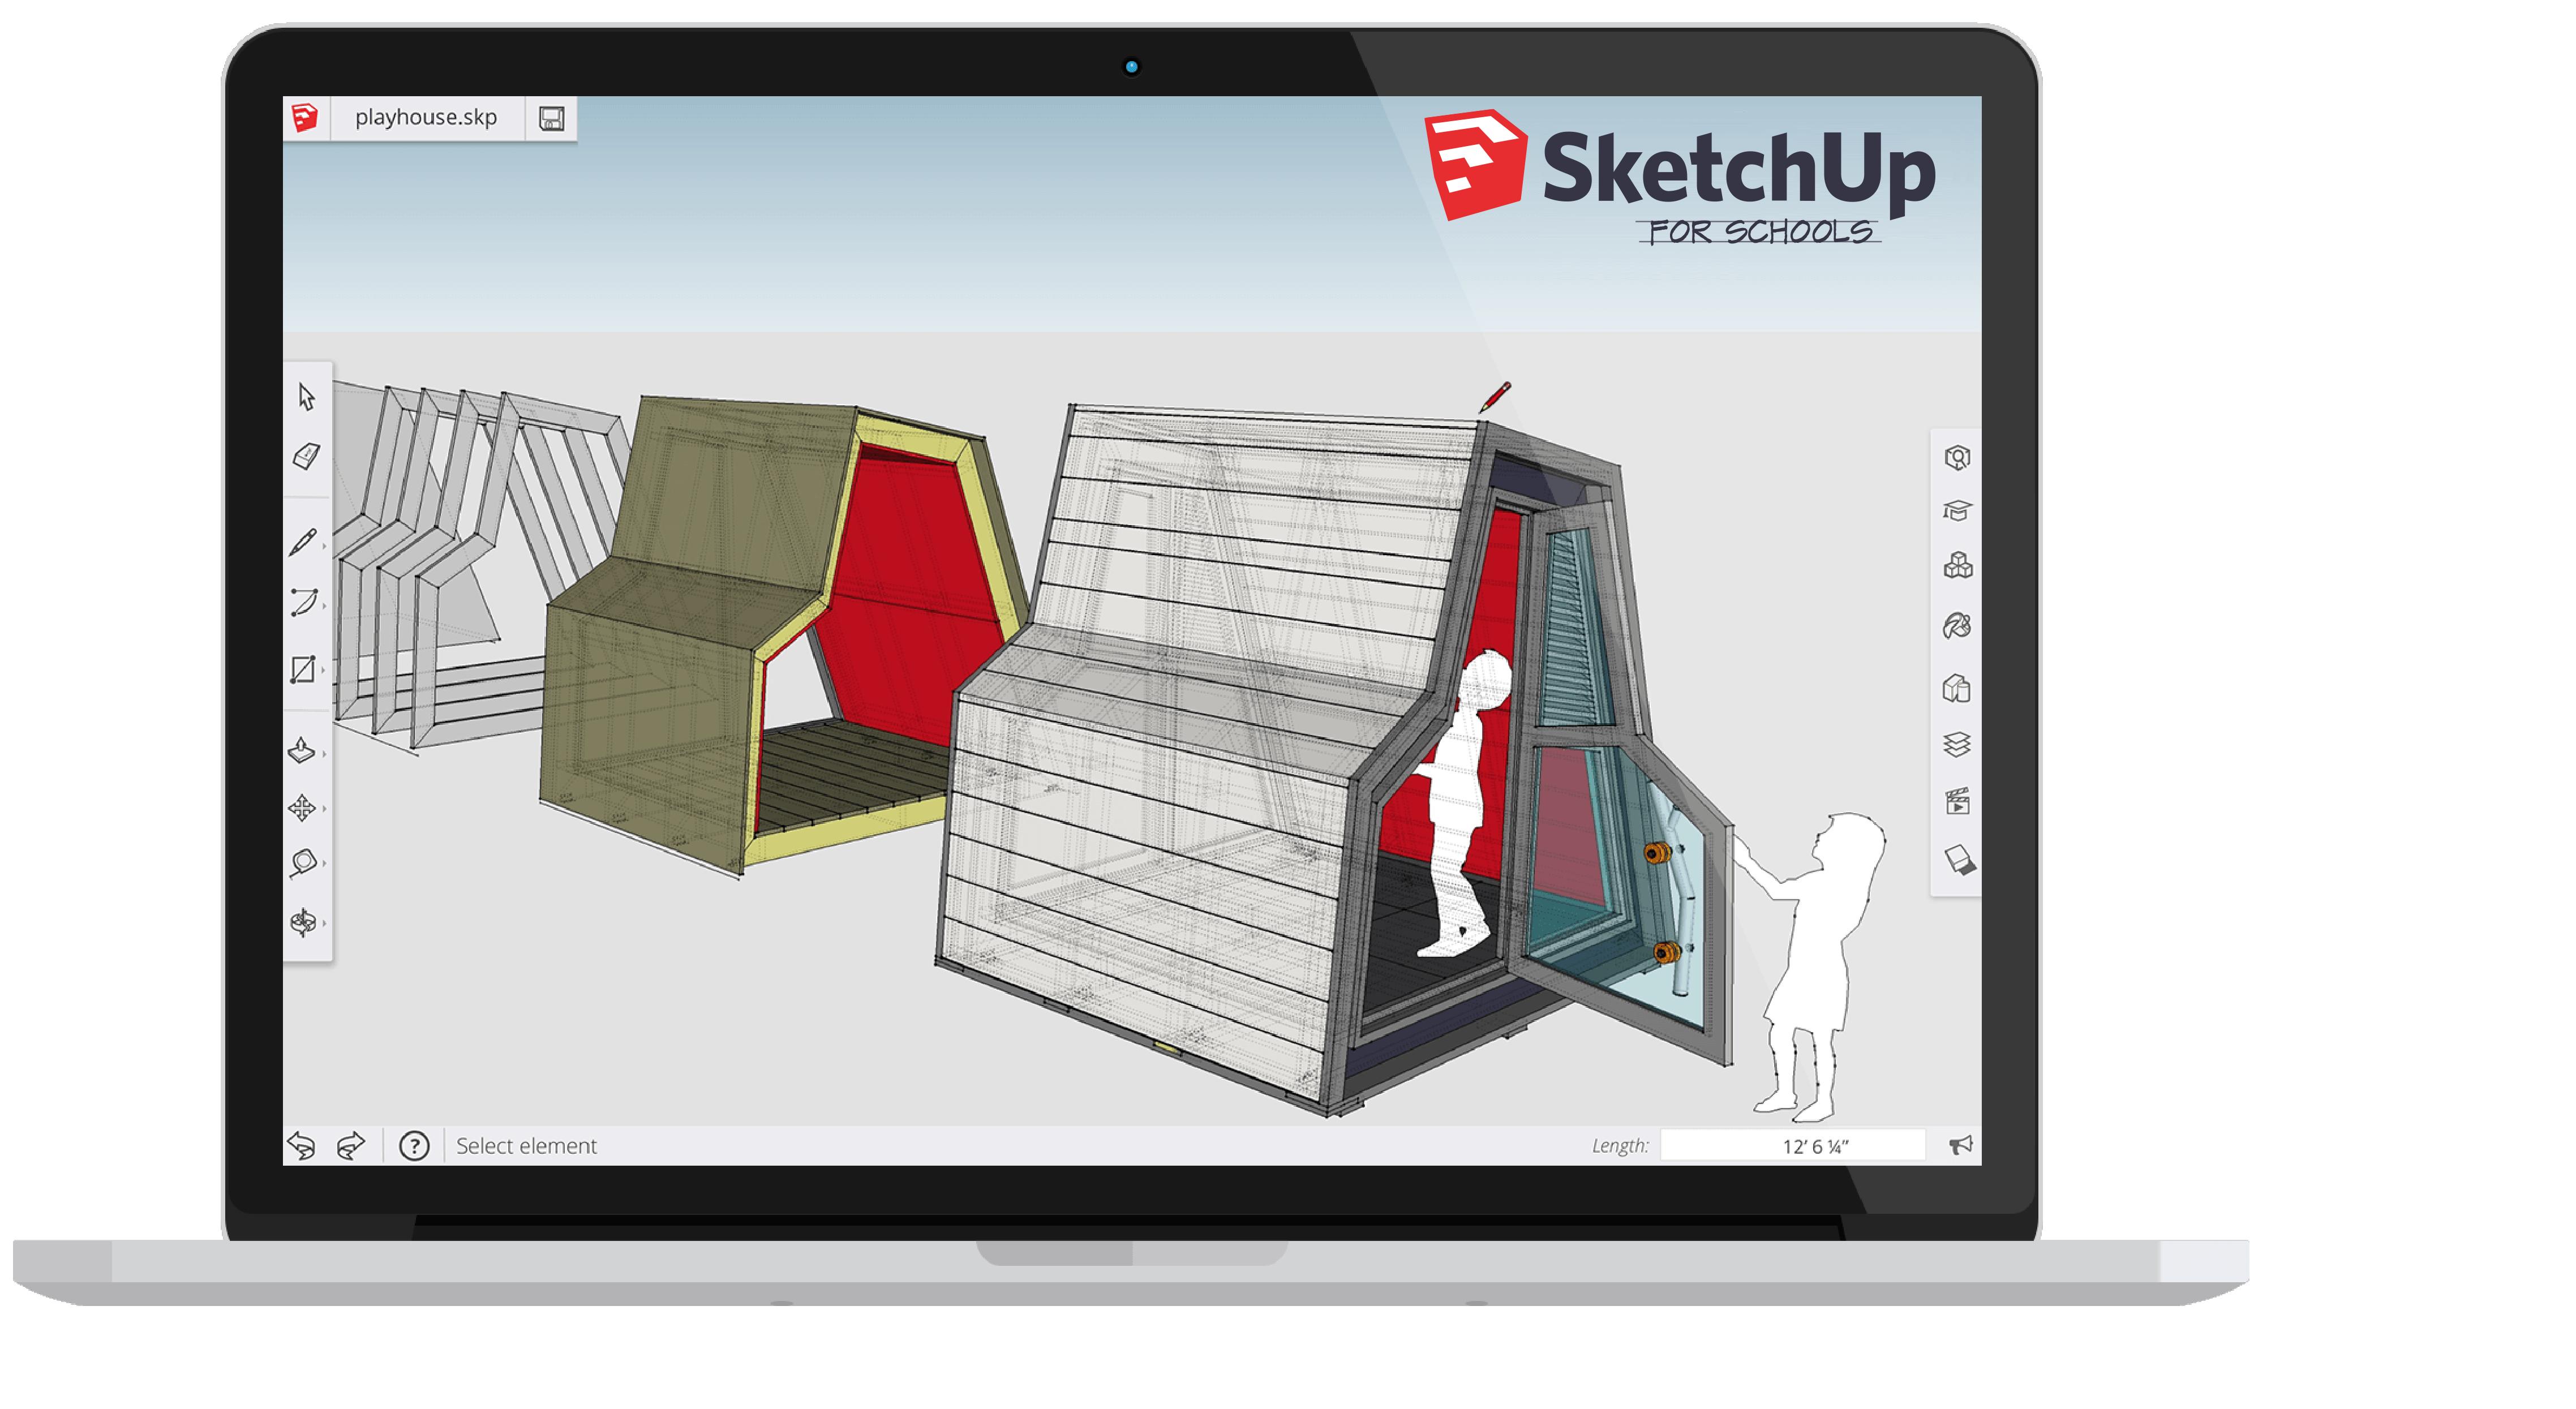 Sketchup For Schools Sketchup Help